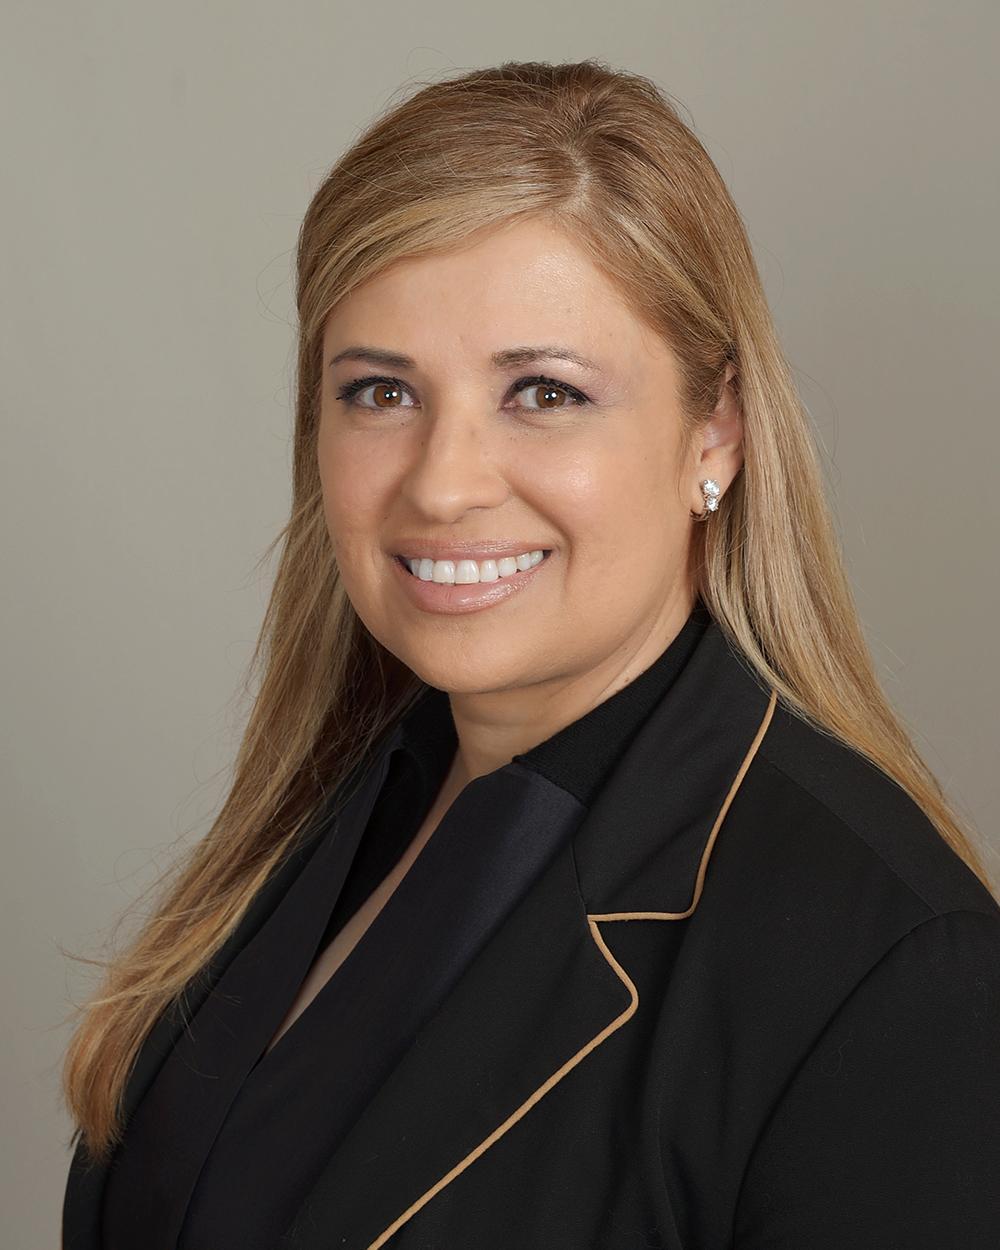 Profile Photo of Dr. Yvette Chapa - None